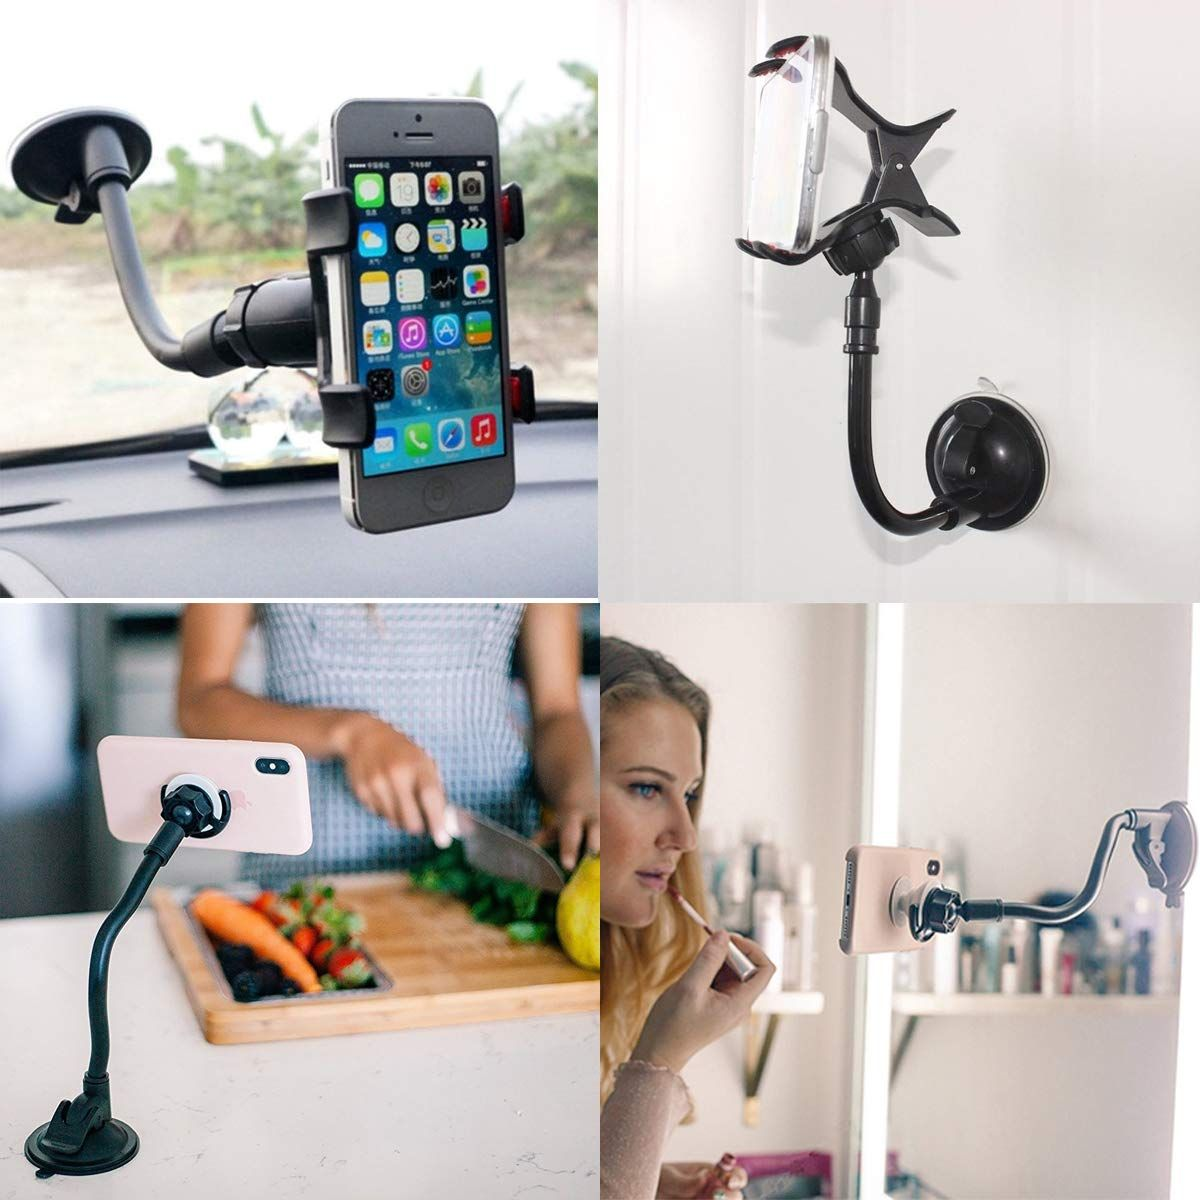 Car Phone Mount Loyaforba Universal Phone Holder For Car Cell